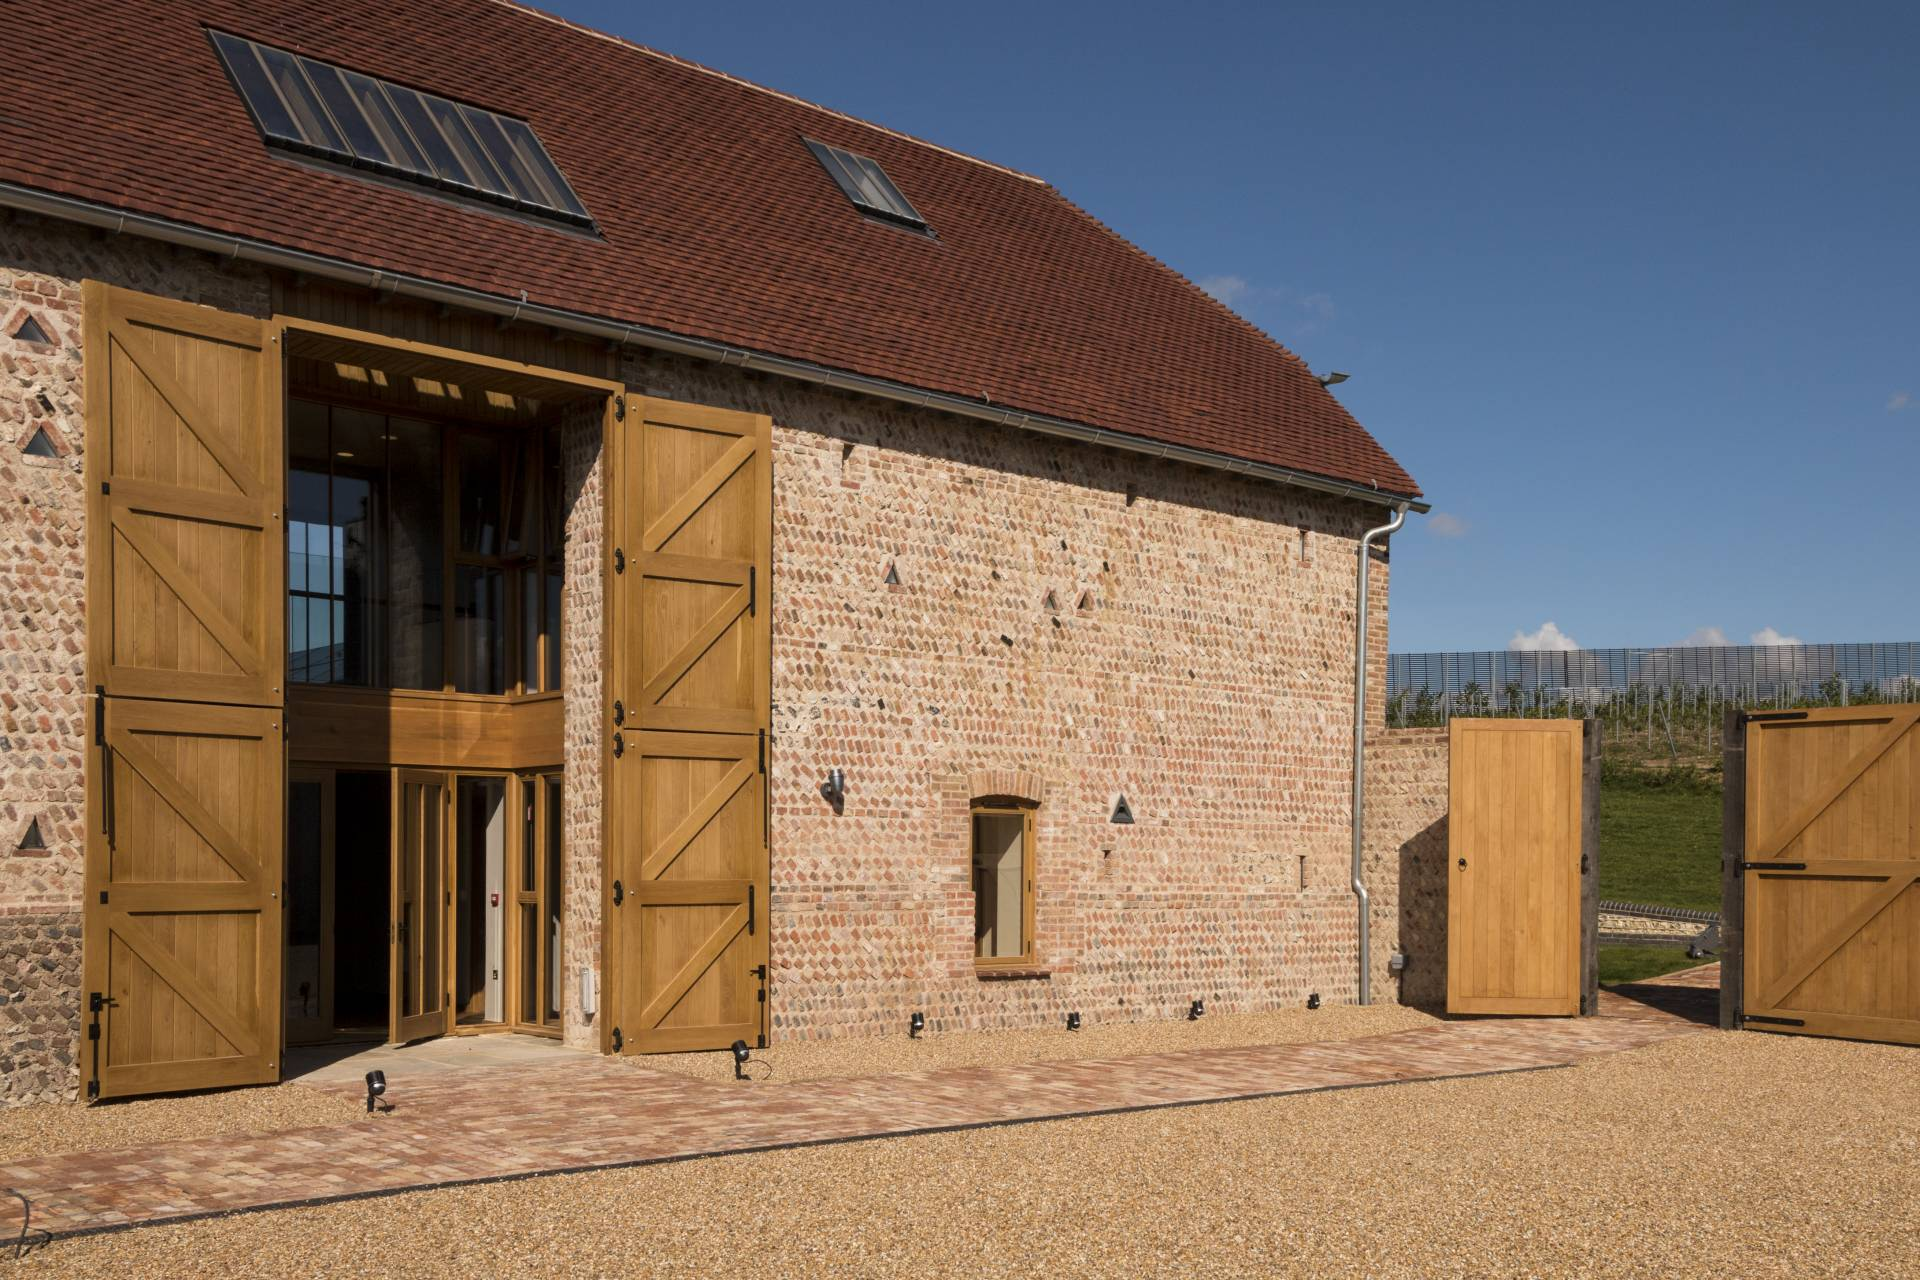 Rathfinny Winery barn